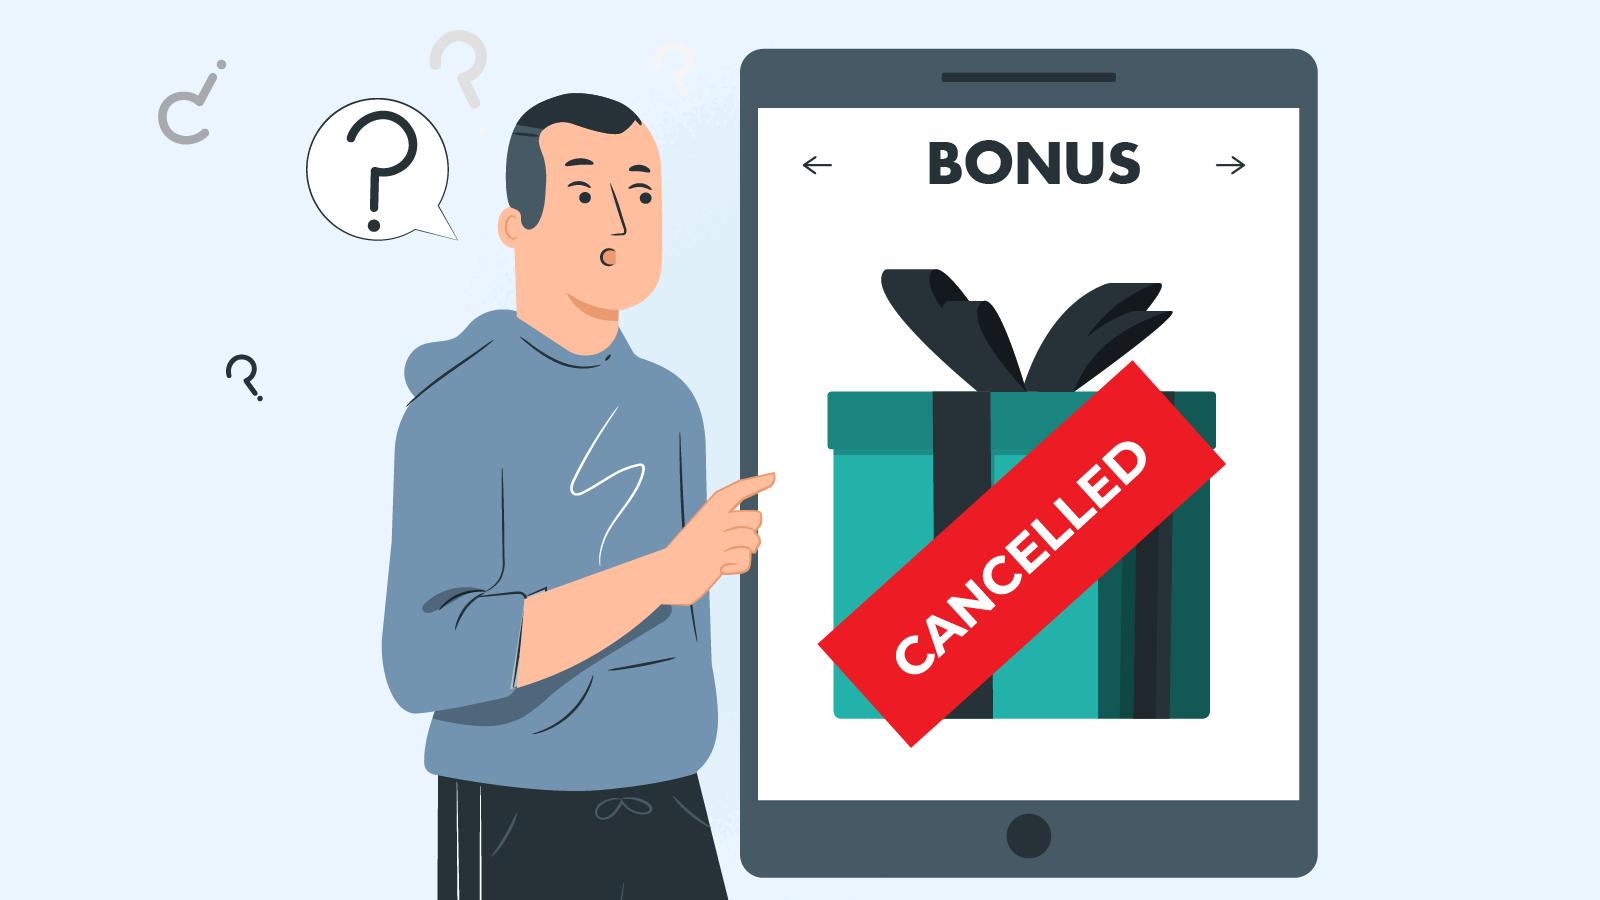 Can a casino cancel your bonus?